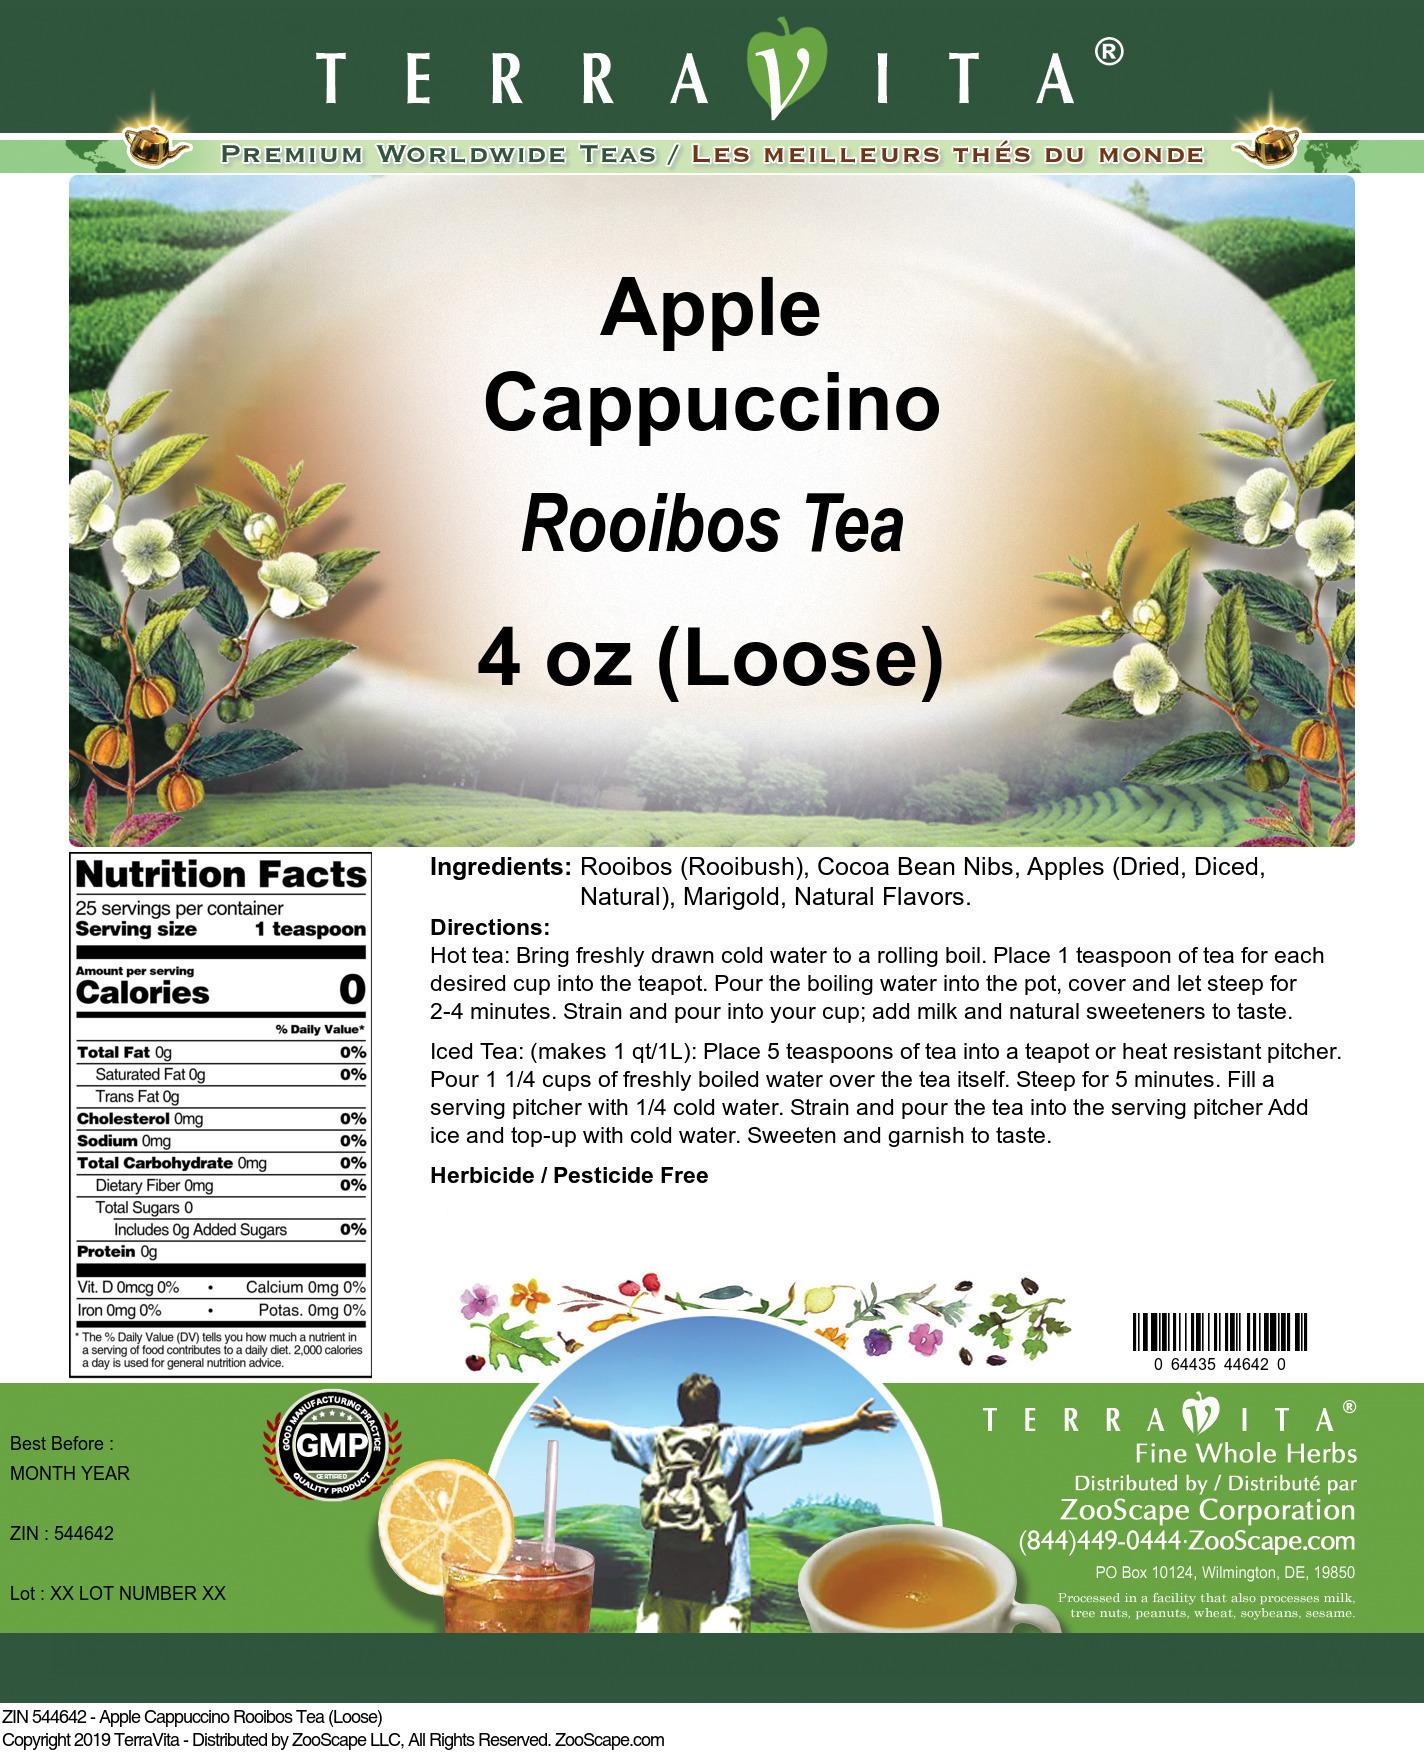 Apple Cappuccino Rooibos Tea (Loose)